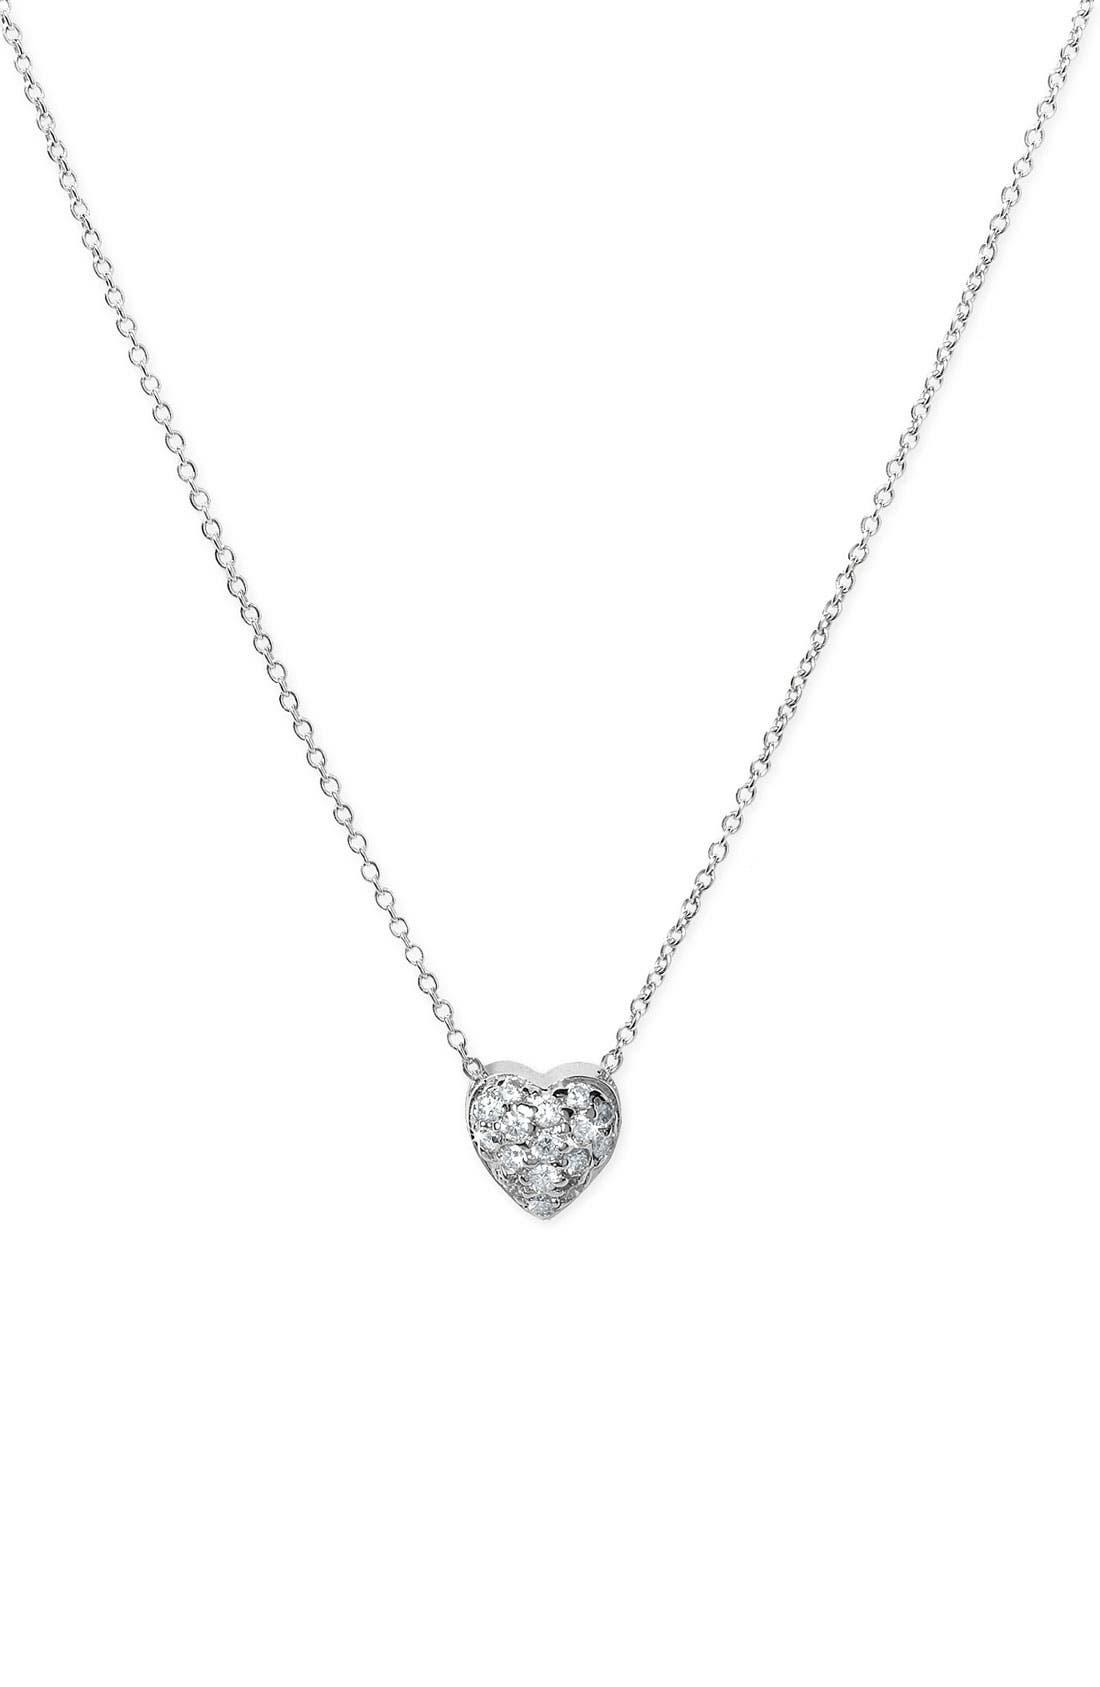 ROBERTO COIN Tiny Treasures Diamond Puffed Heart Pendant Necklace